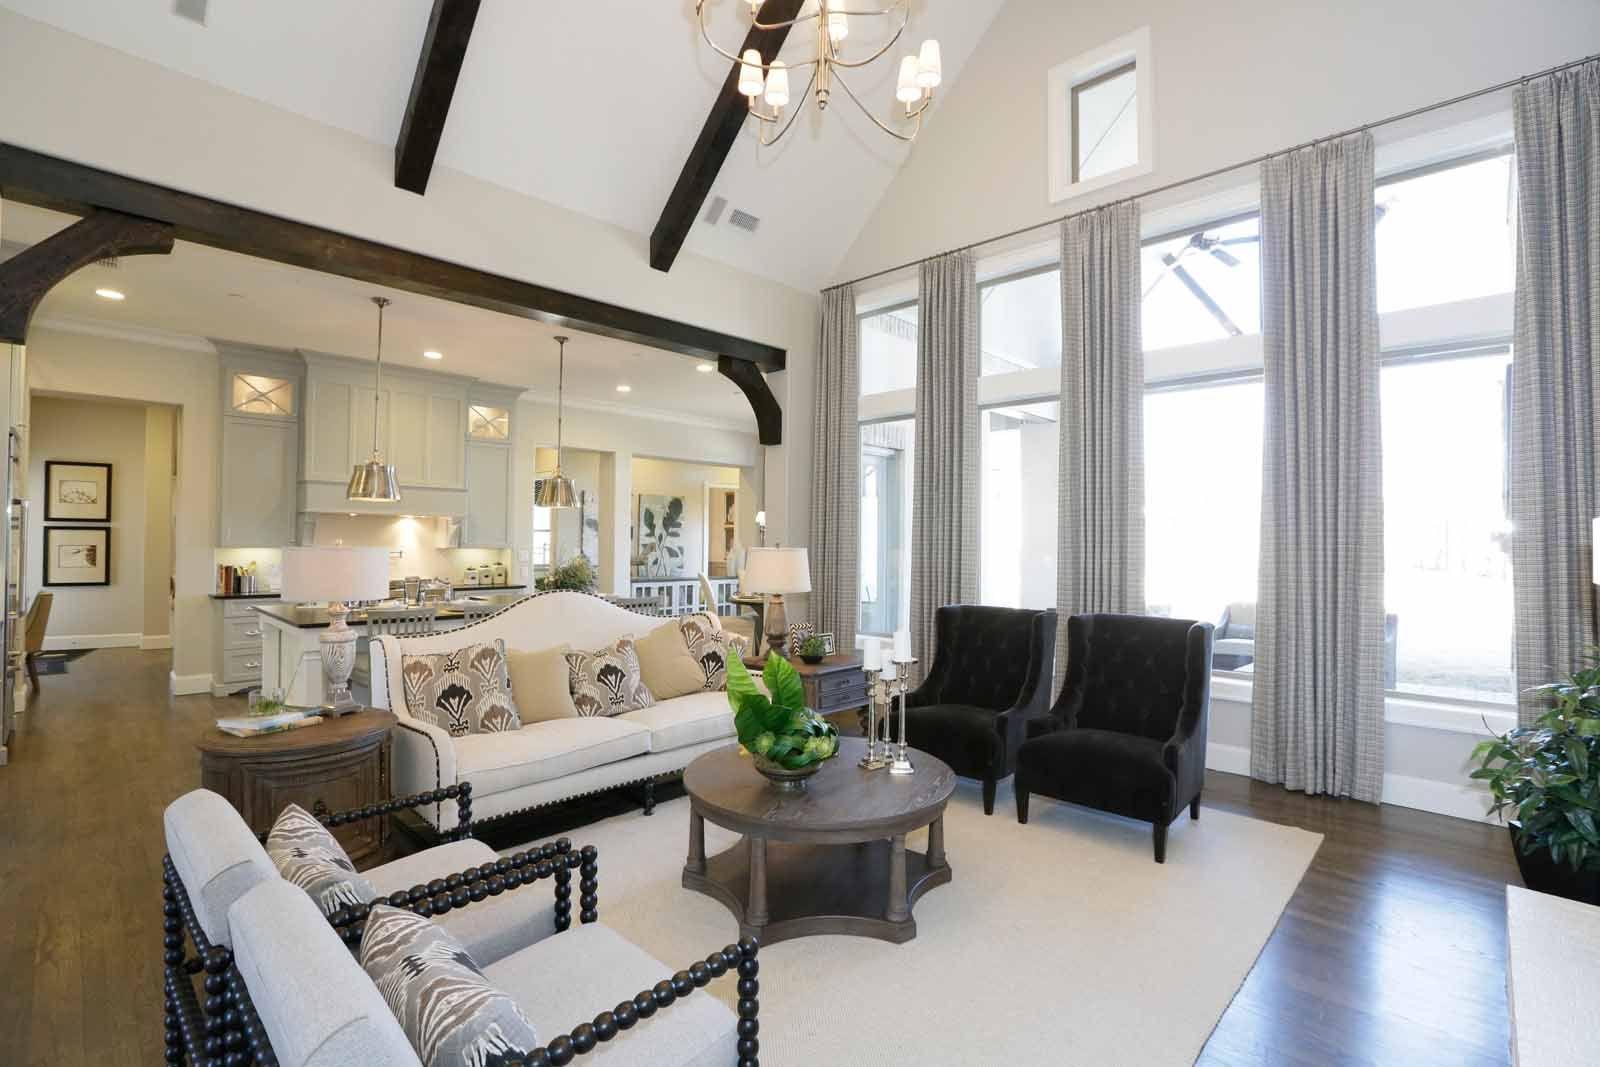 Attractive Southgate Homes Hamilton Hills Allen TX 75013 | Luxury Model Home For Sale  | Allen Property Listing: MLS#